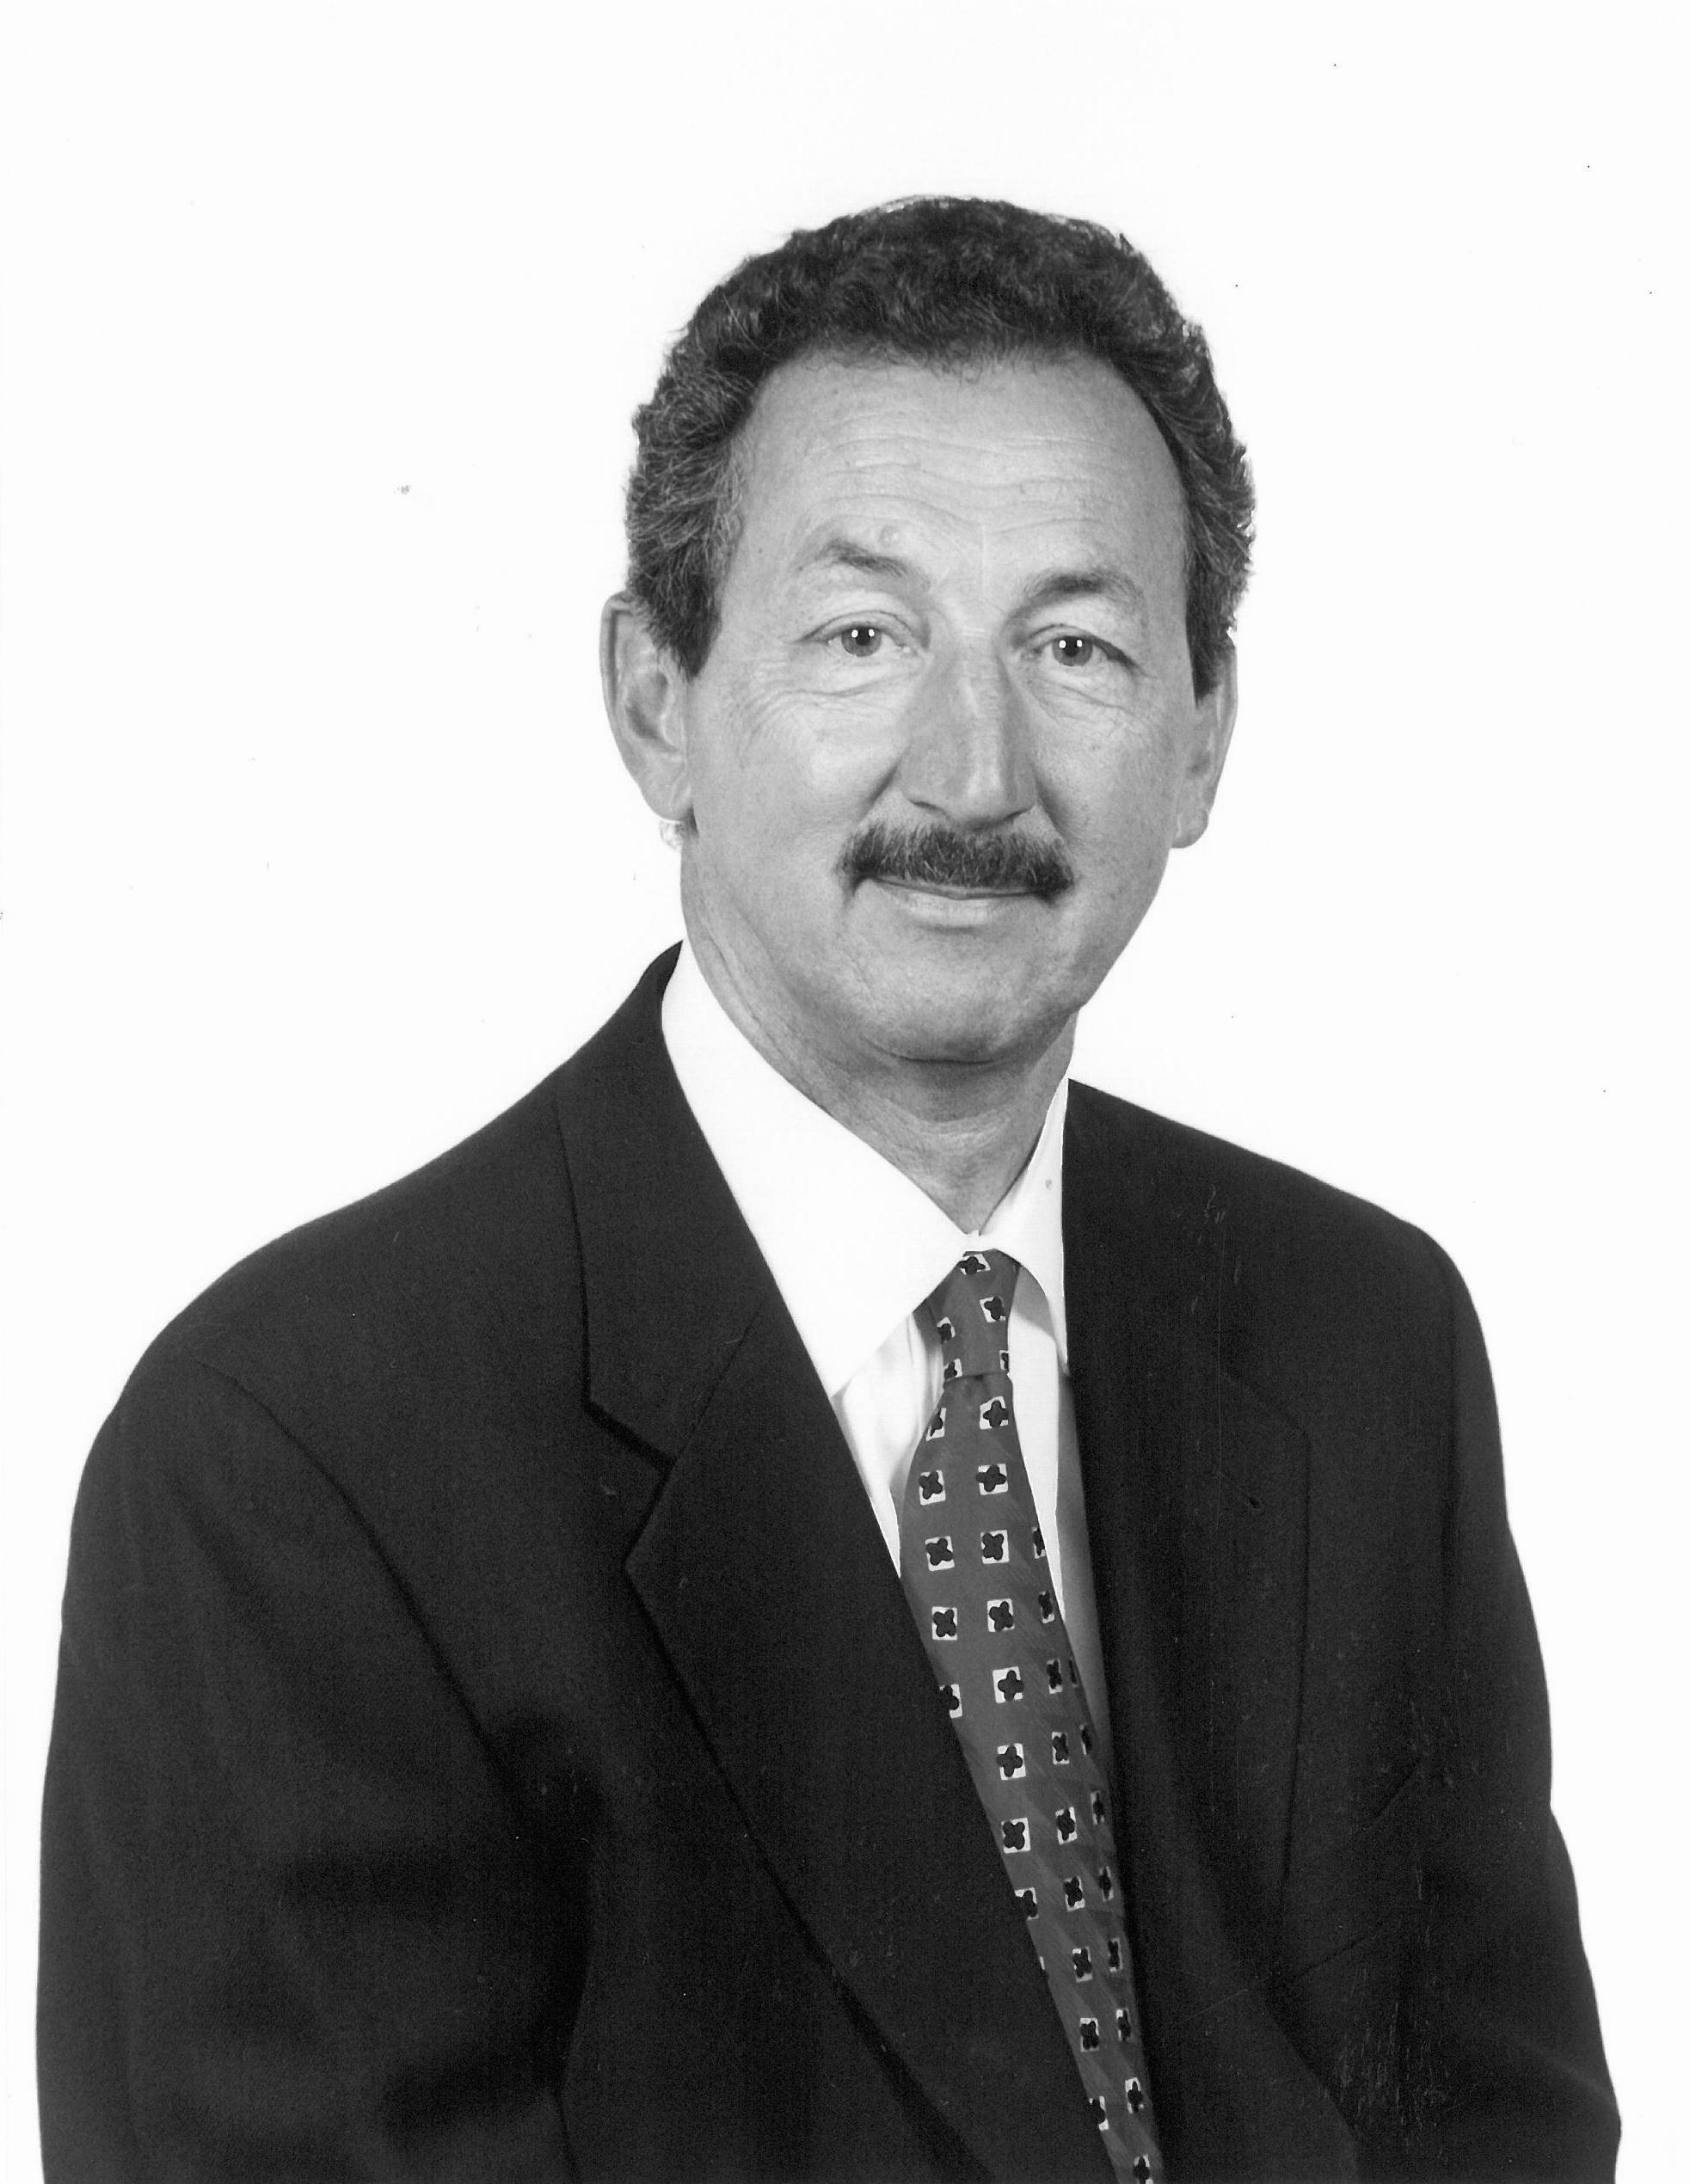 Thomas Triscari